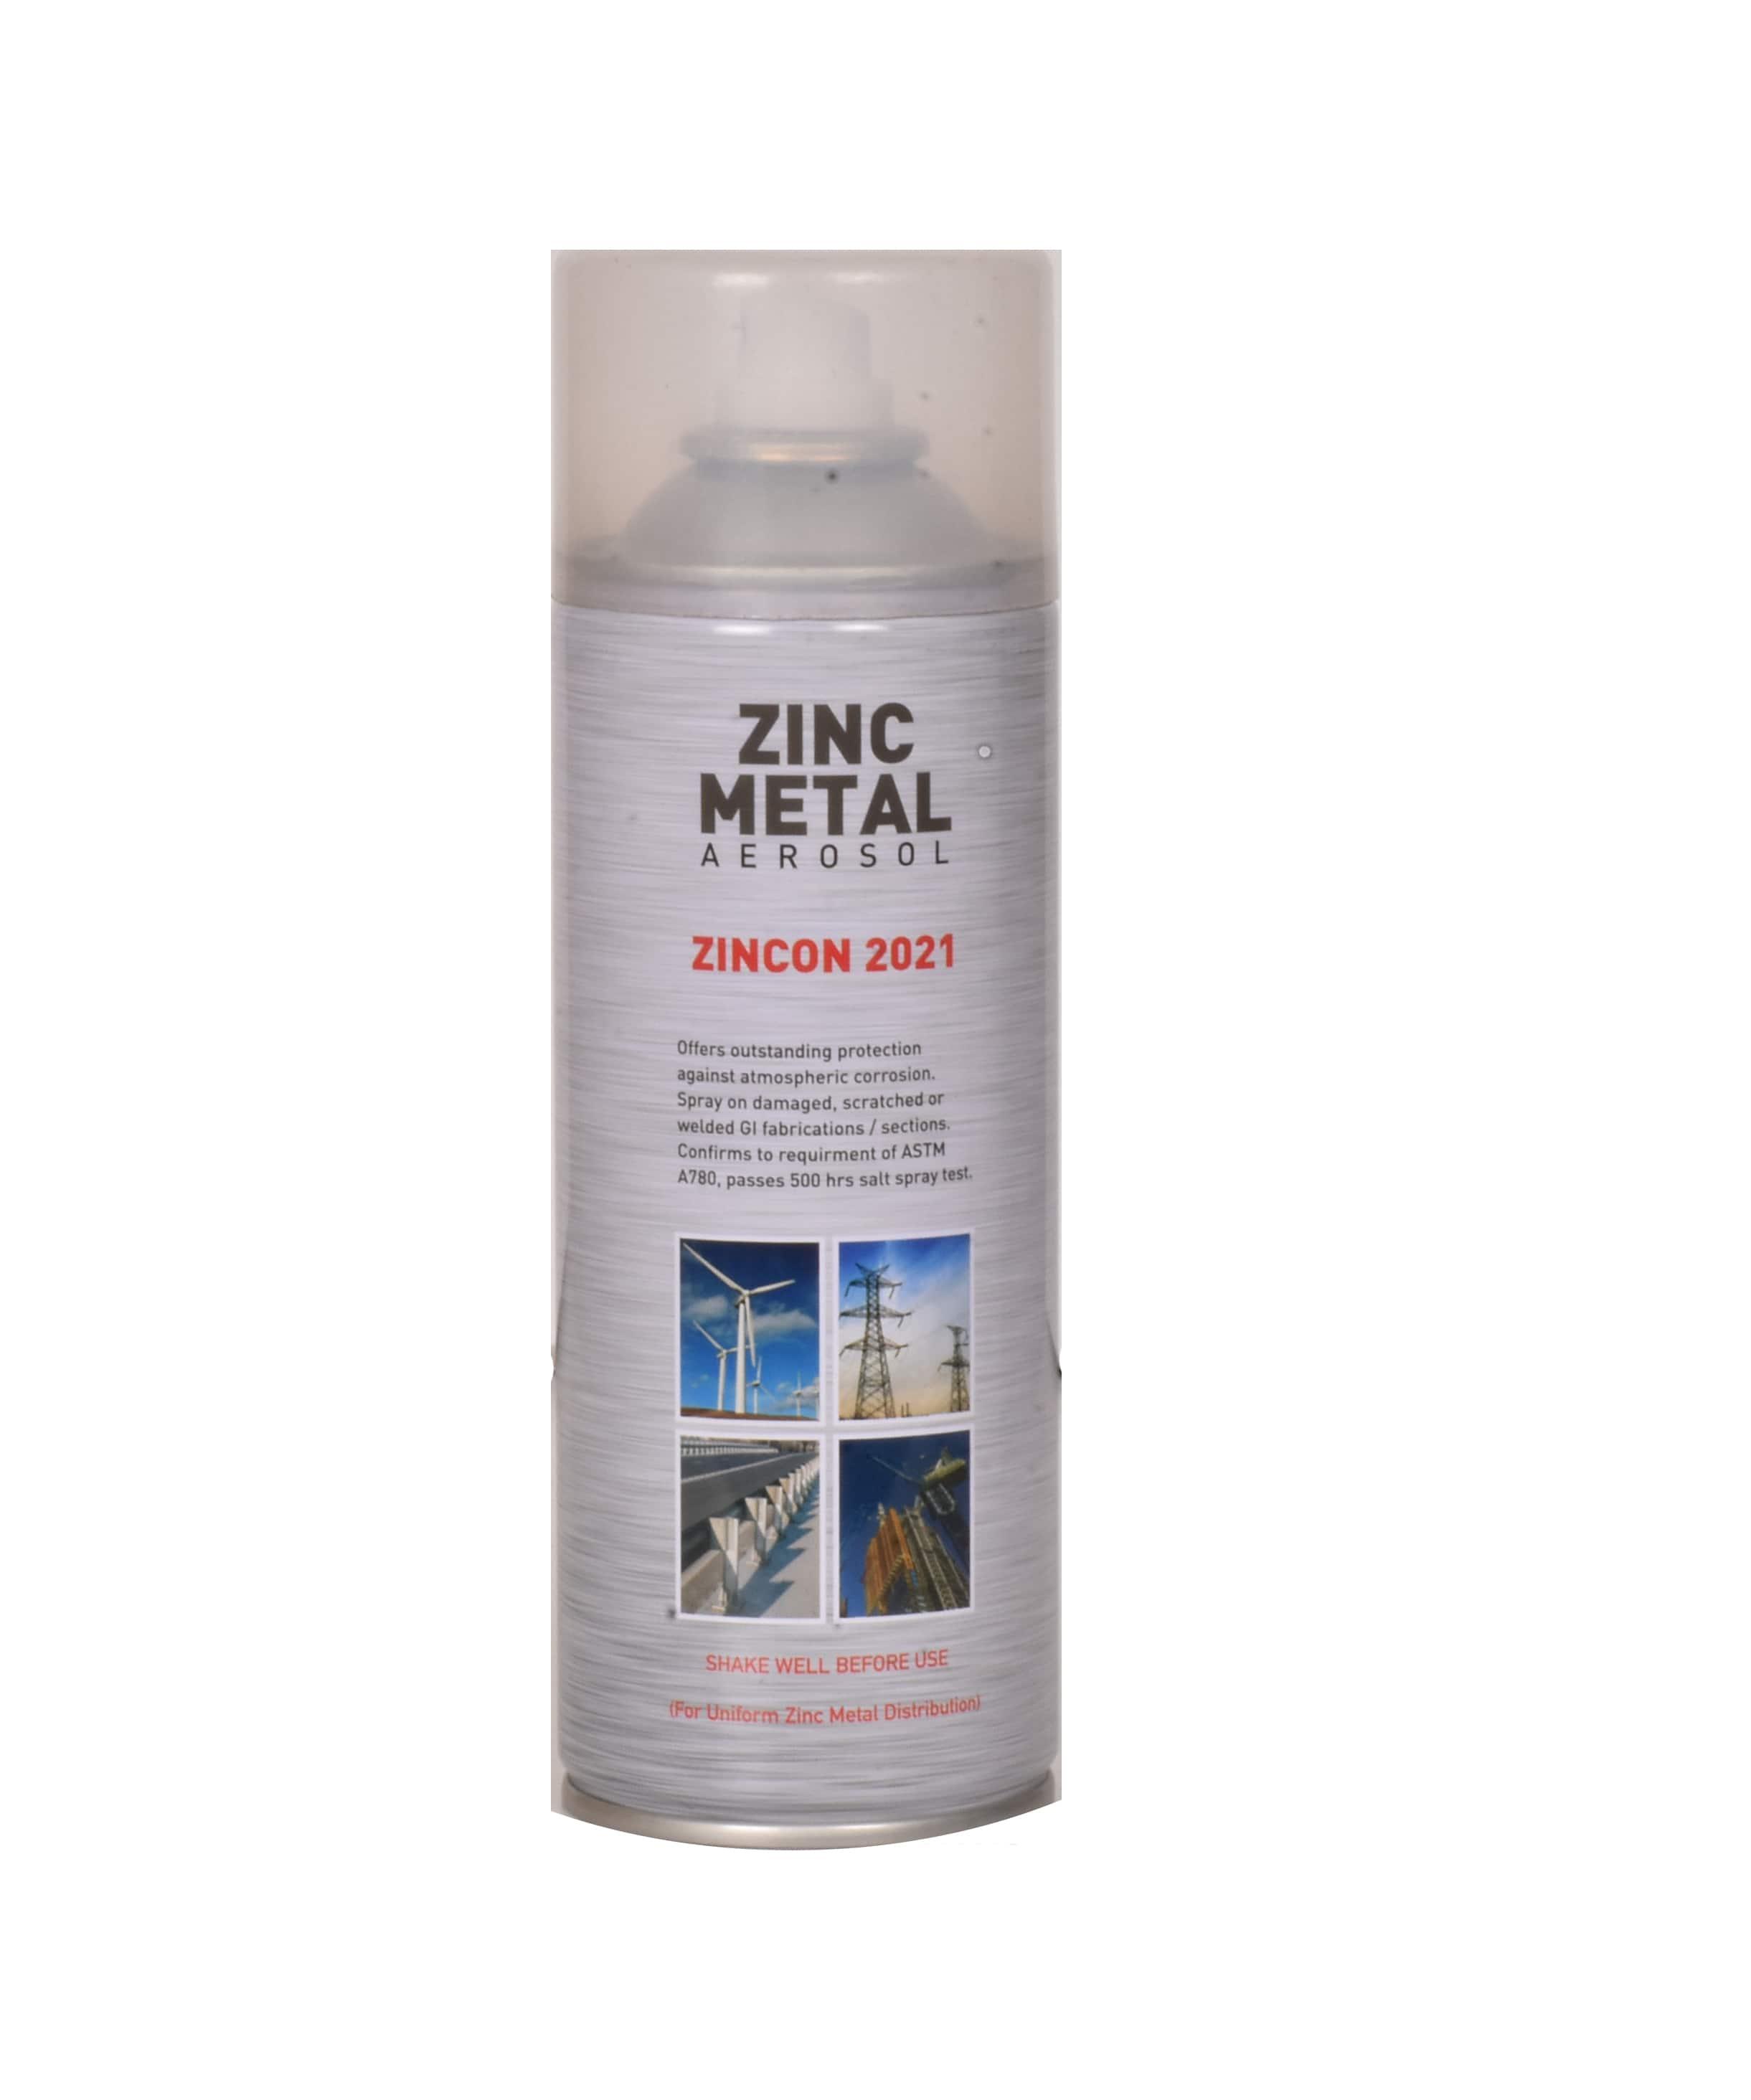 Zincon 2021 Zinc Metal Aerosol